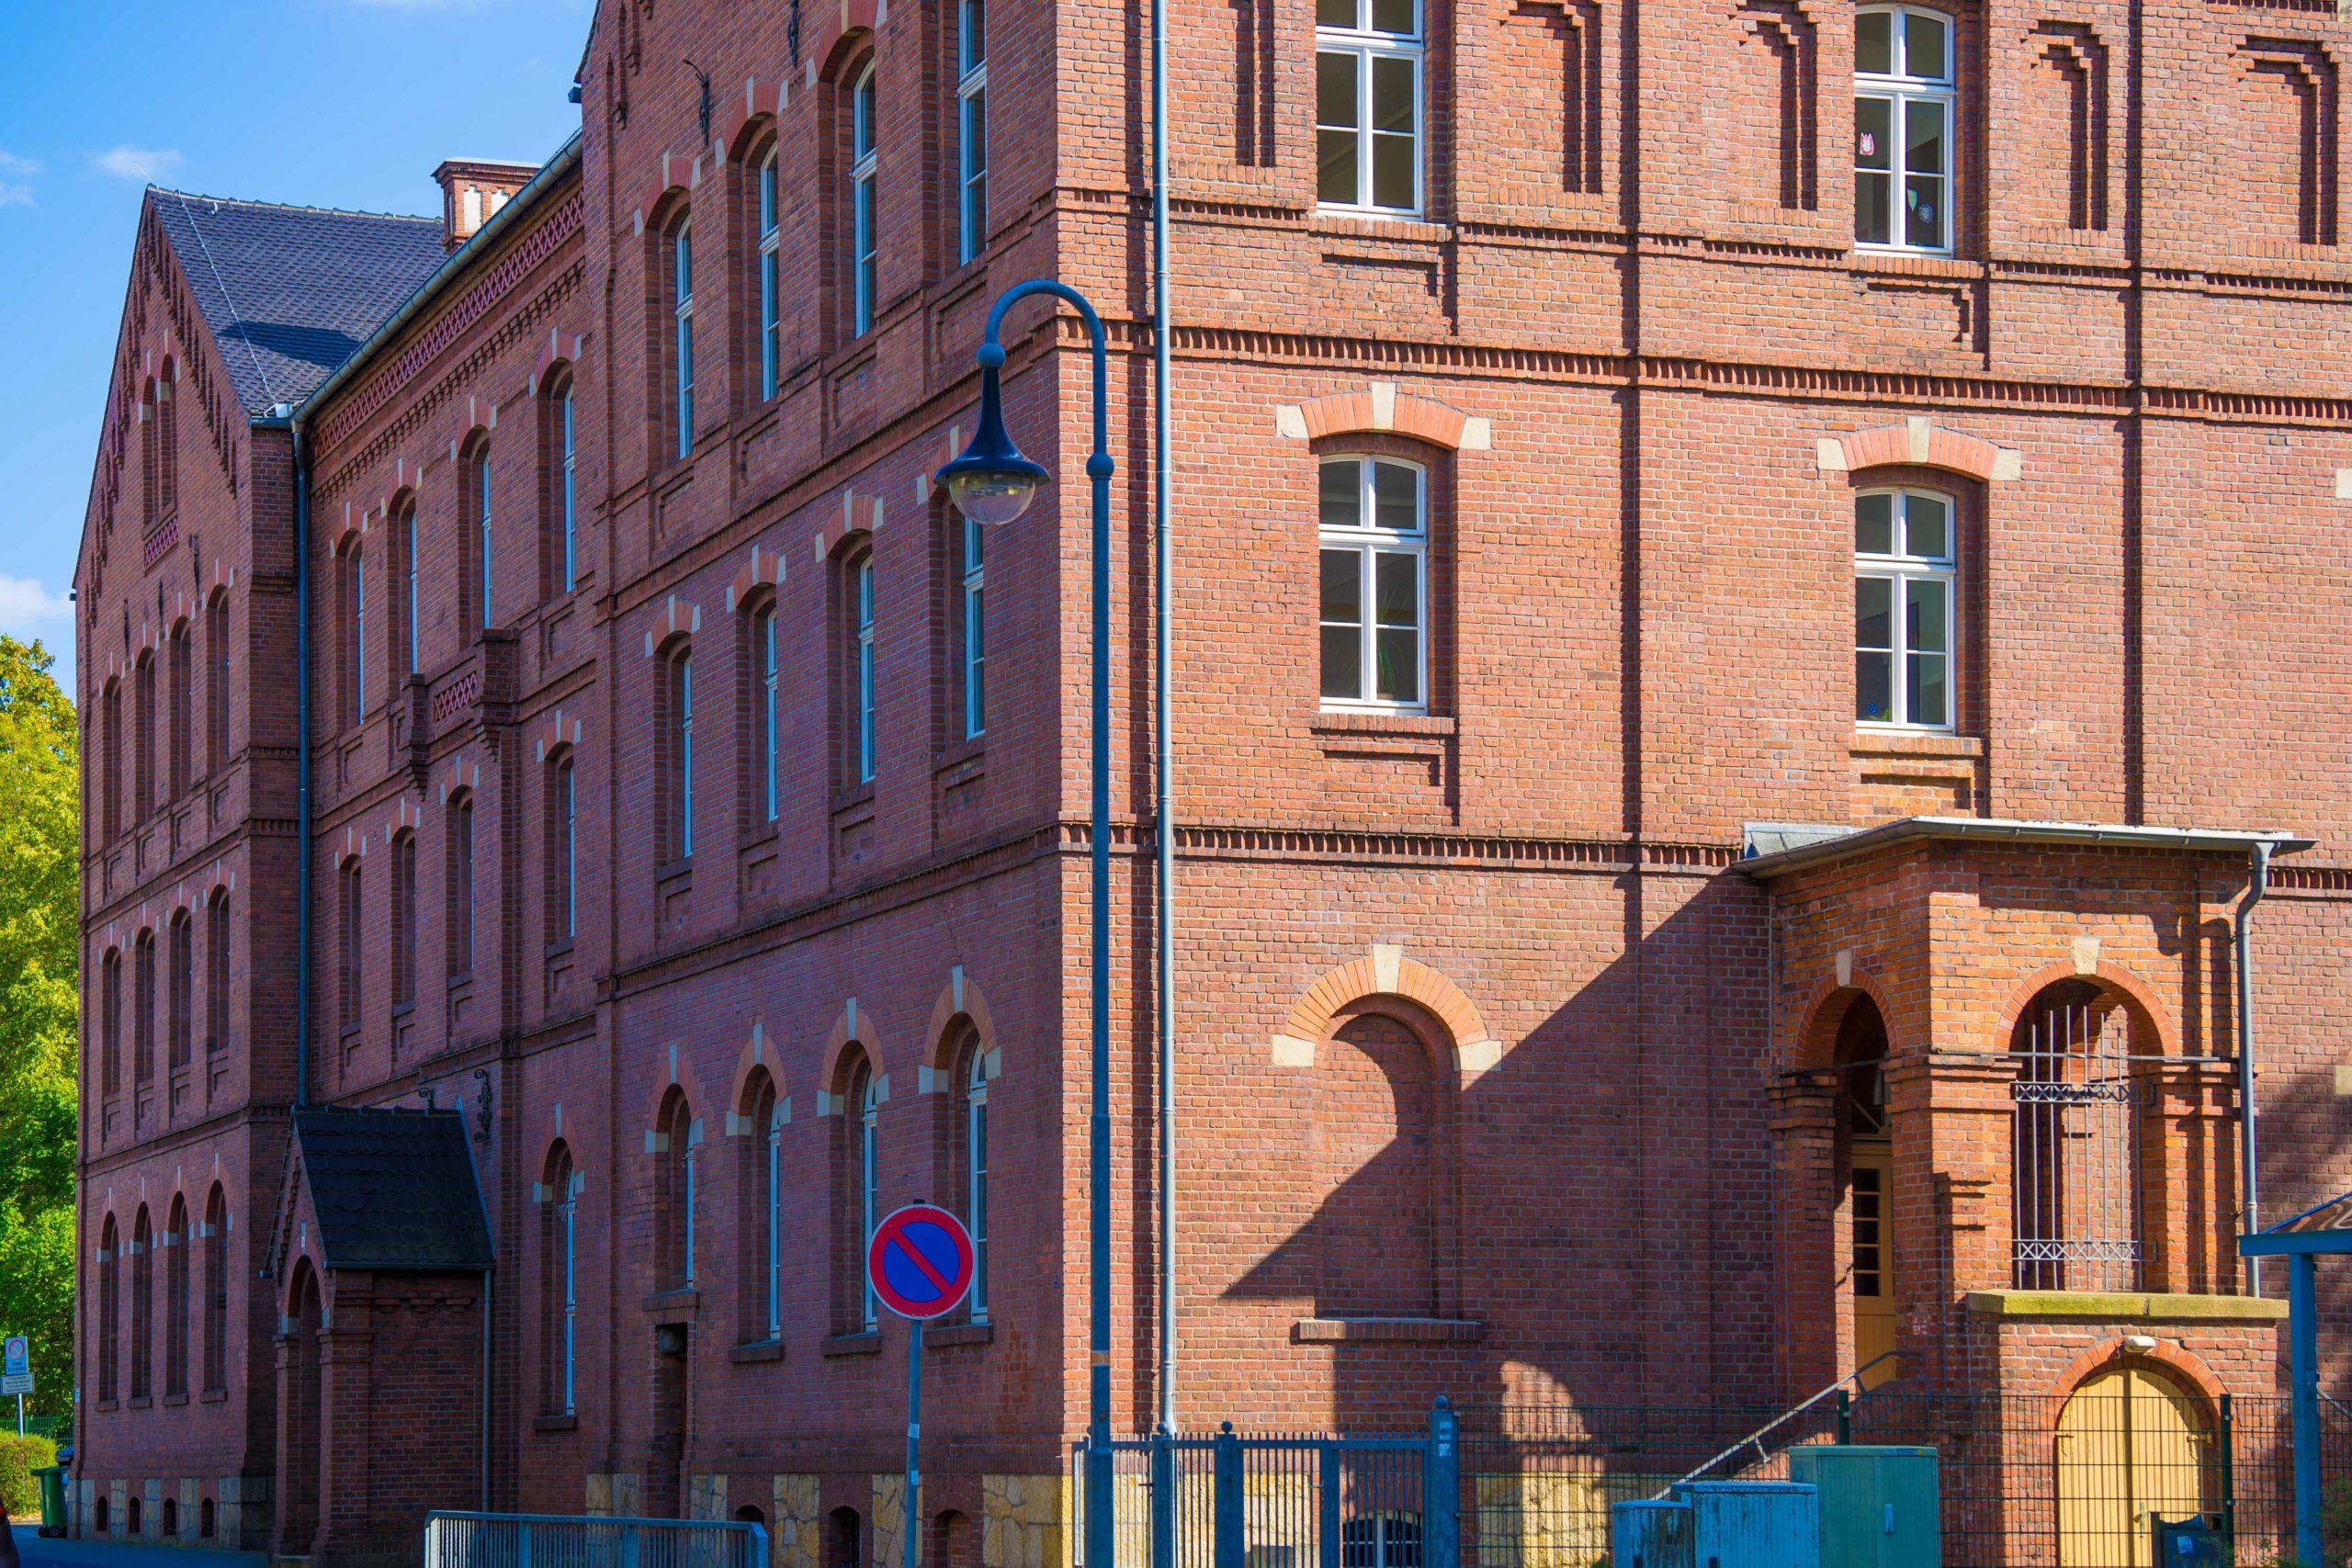 Niesky (sorbisch: Nizka), Oberlausitz, die Rote Schule